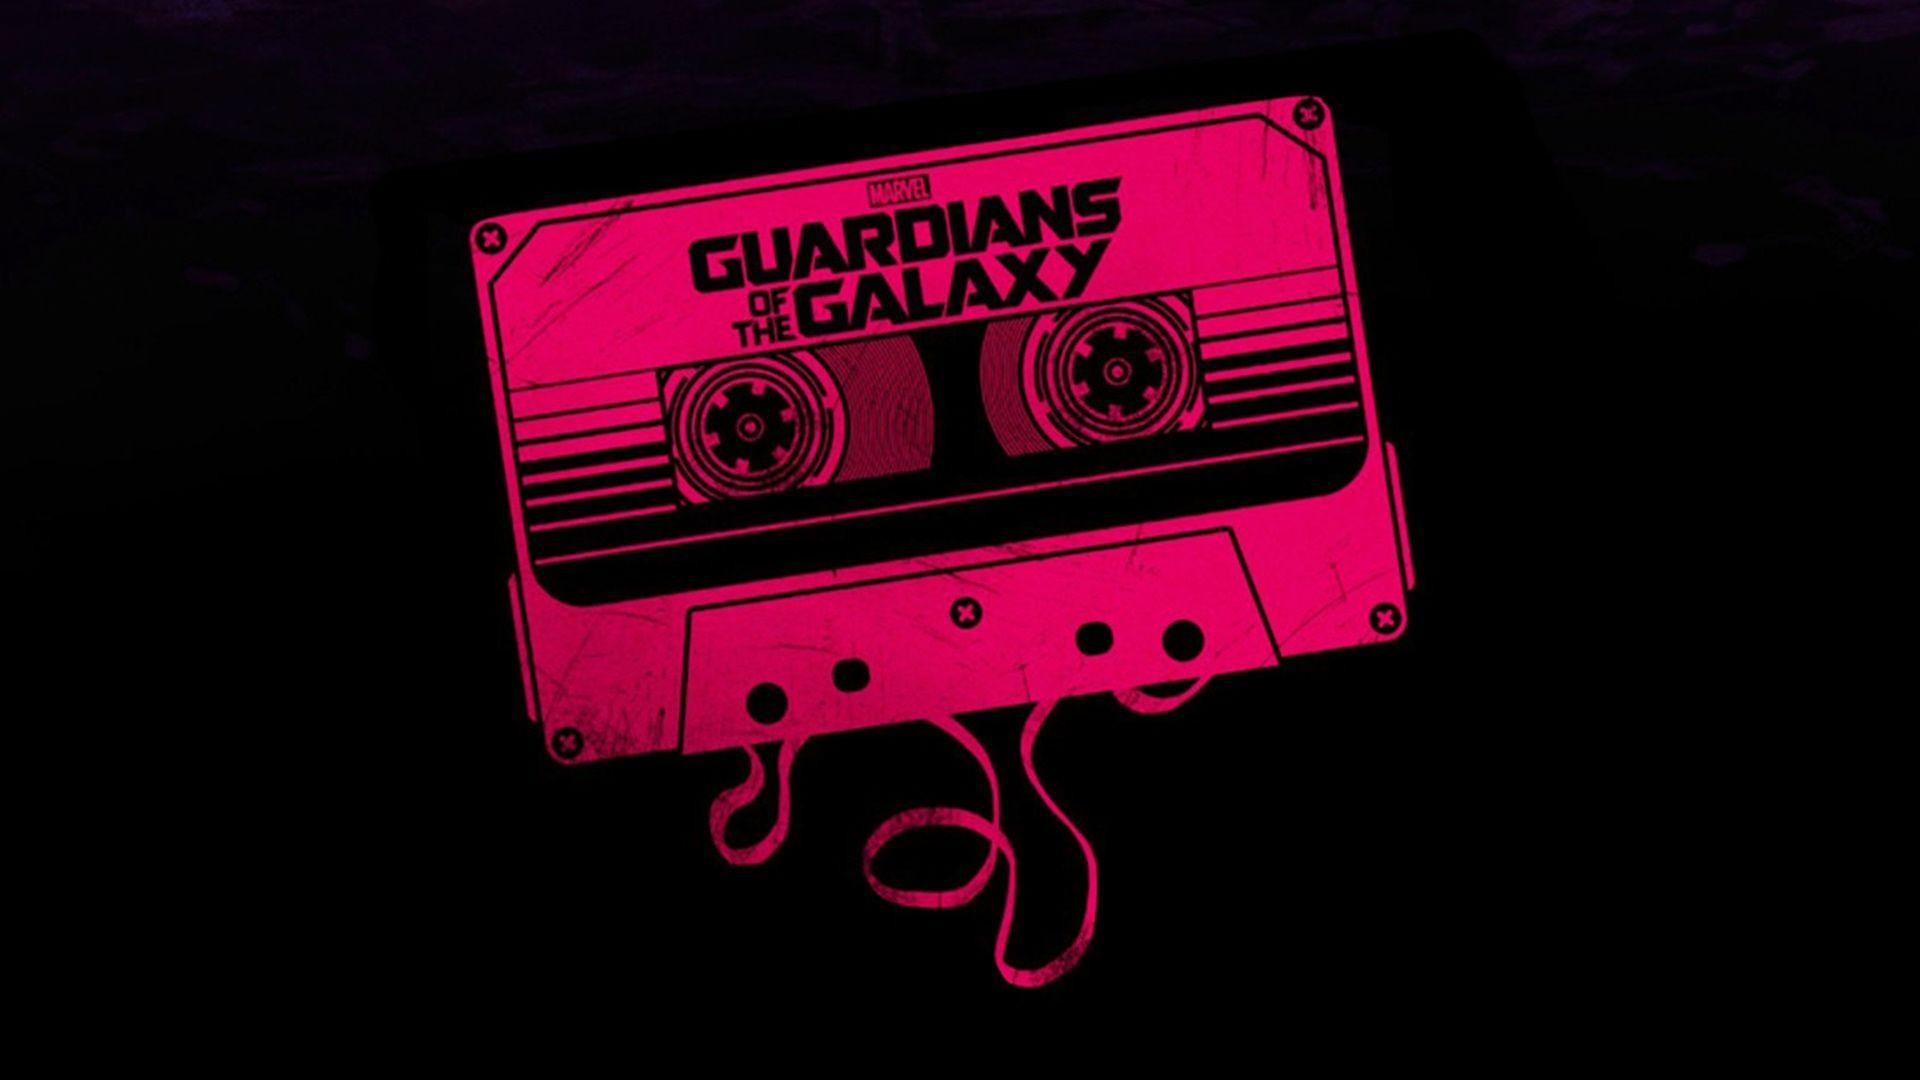 Guardians Of The Galaxy Marvel Cassette Hd Wallpaper Jpg 1920 1080 Herois Marvel Marvel Wallpaper